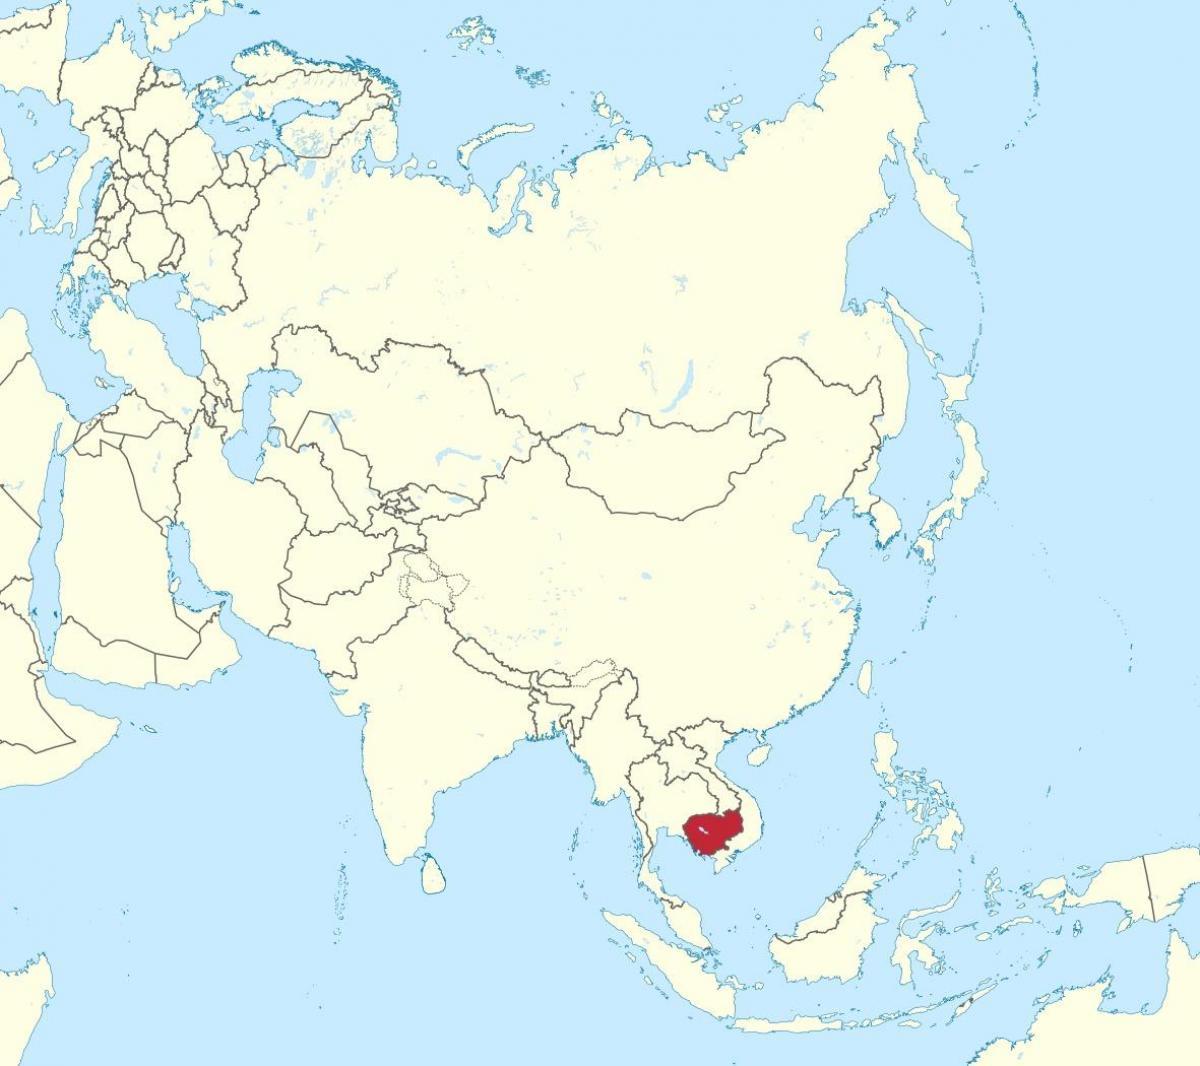 Cambodja Kort I Asien Kort Over Cambodja I Asien Syd Ostlige